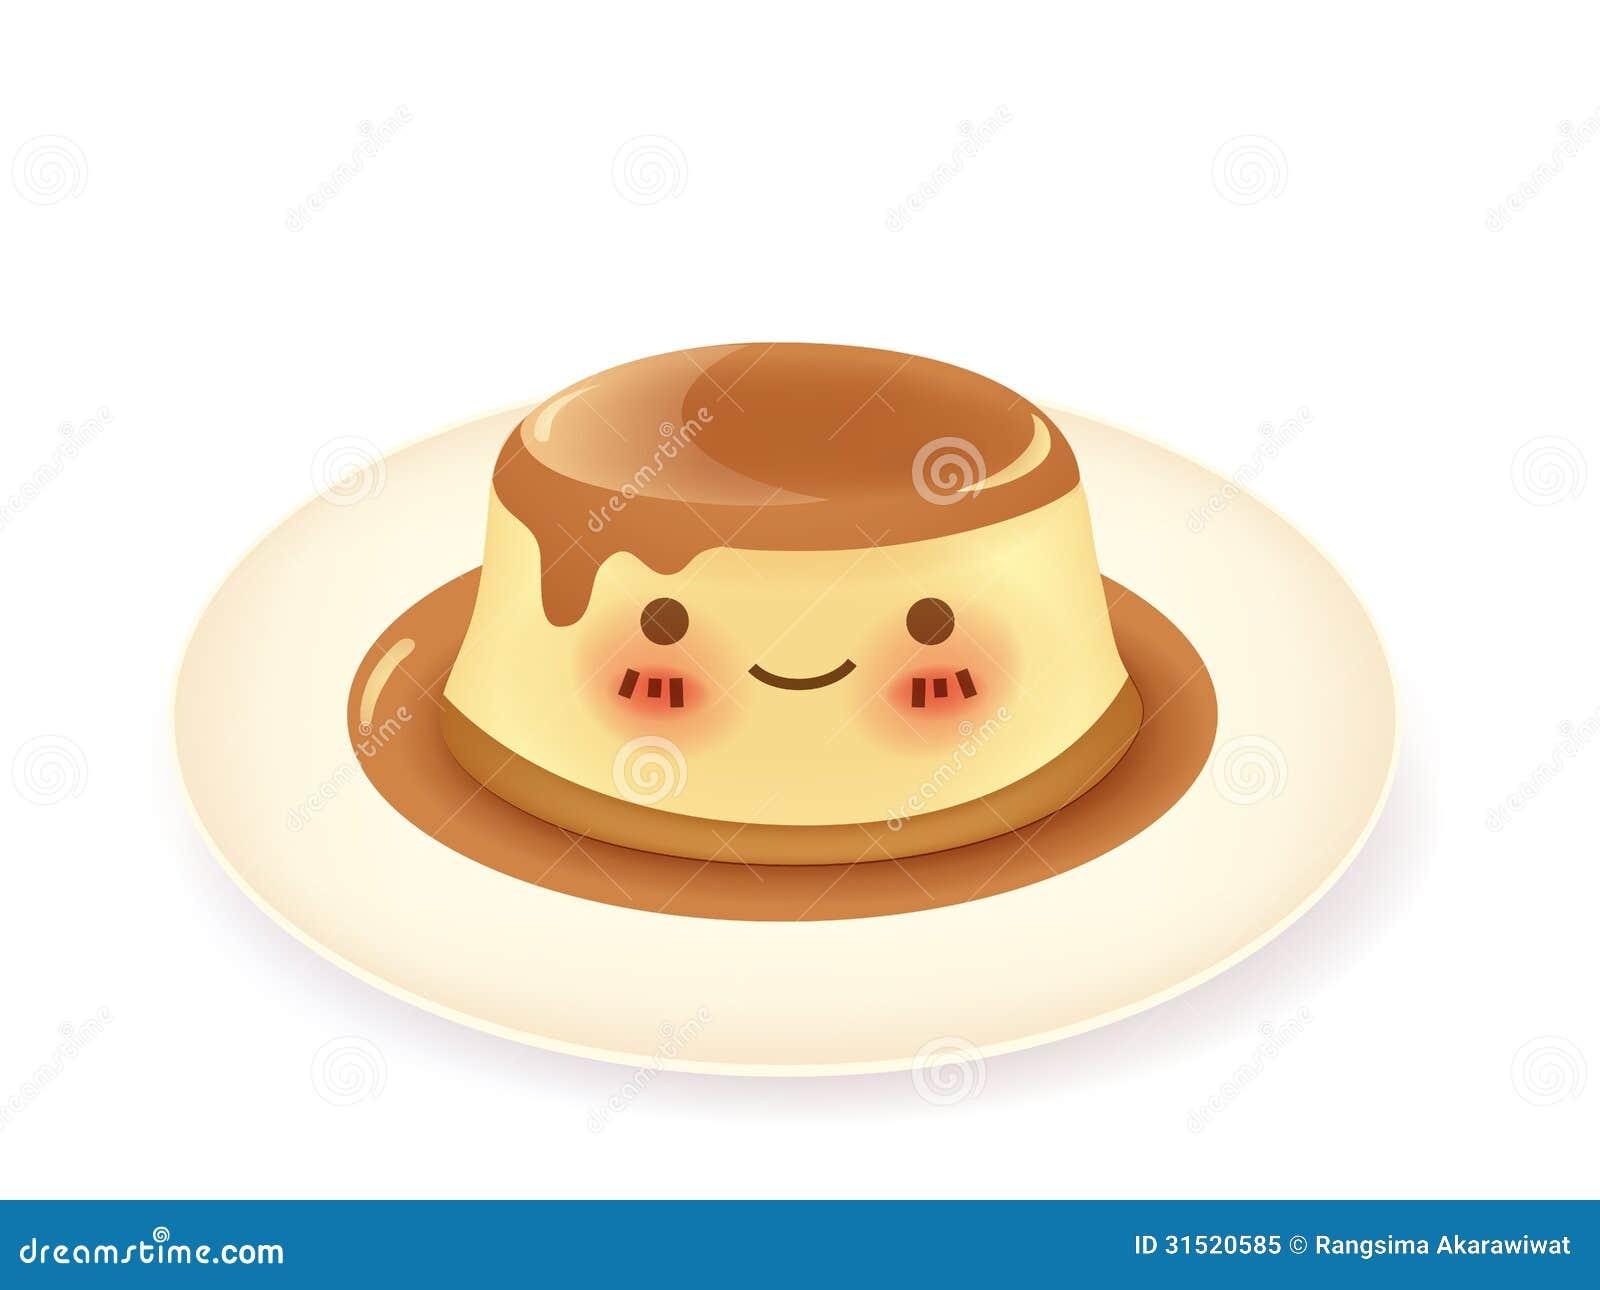 Cake Vector File